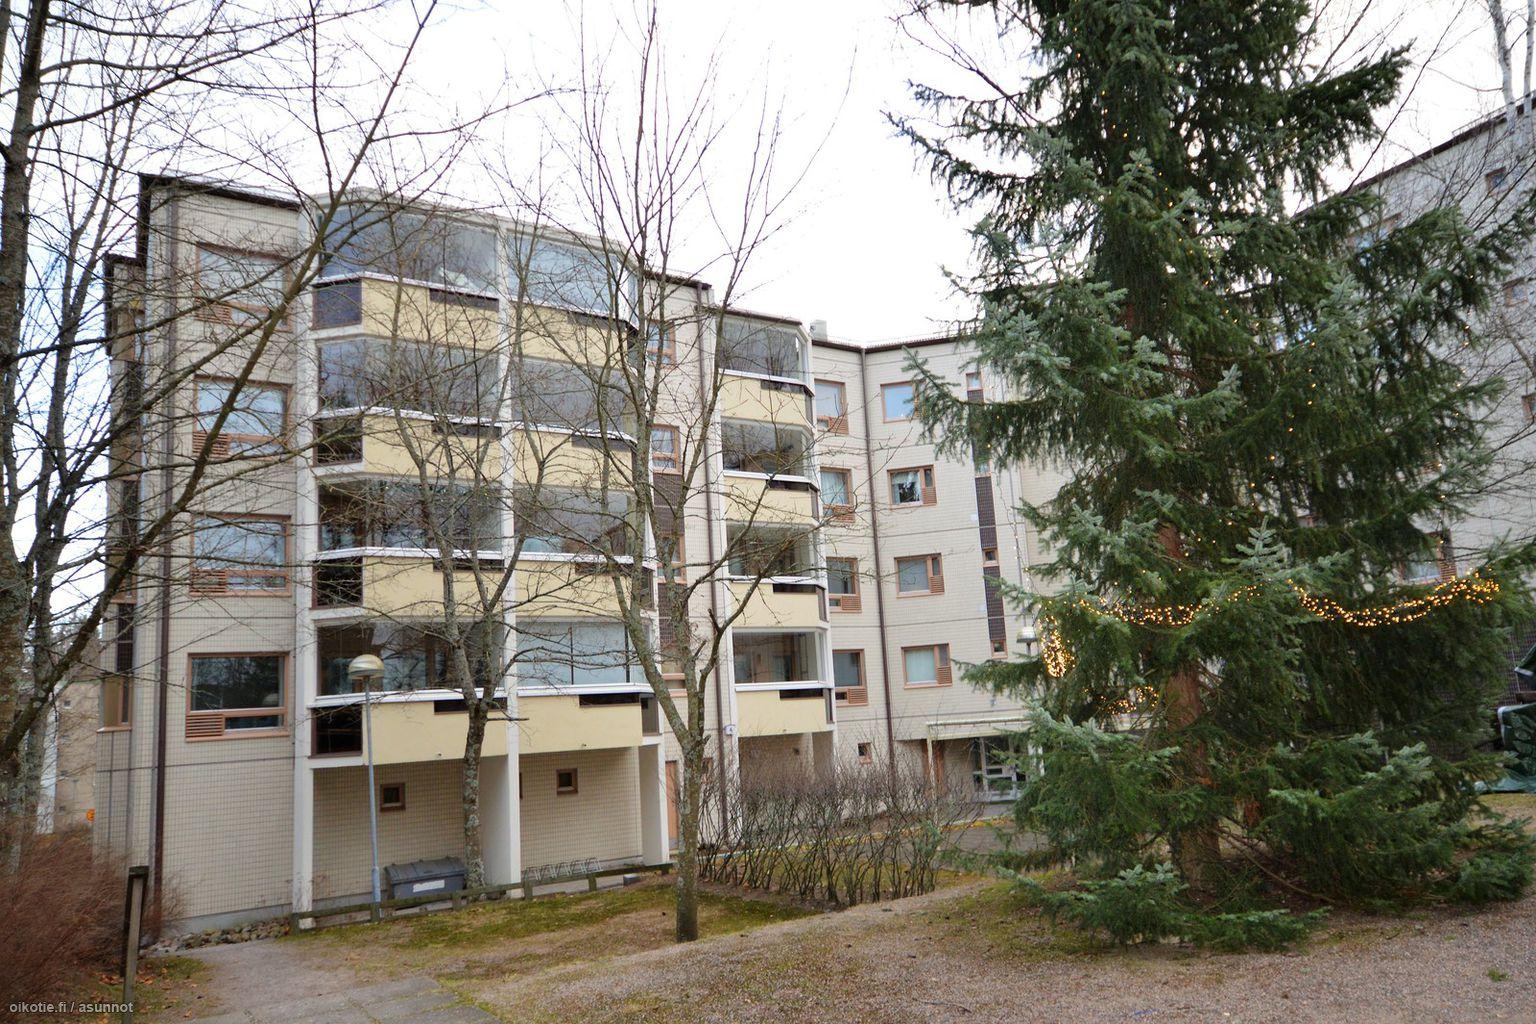 01600 Finland